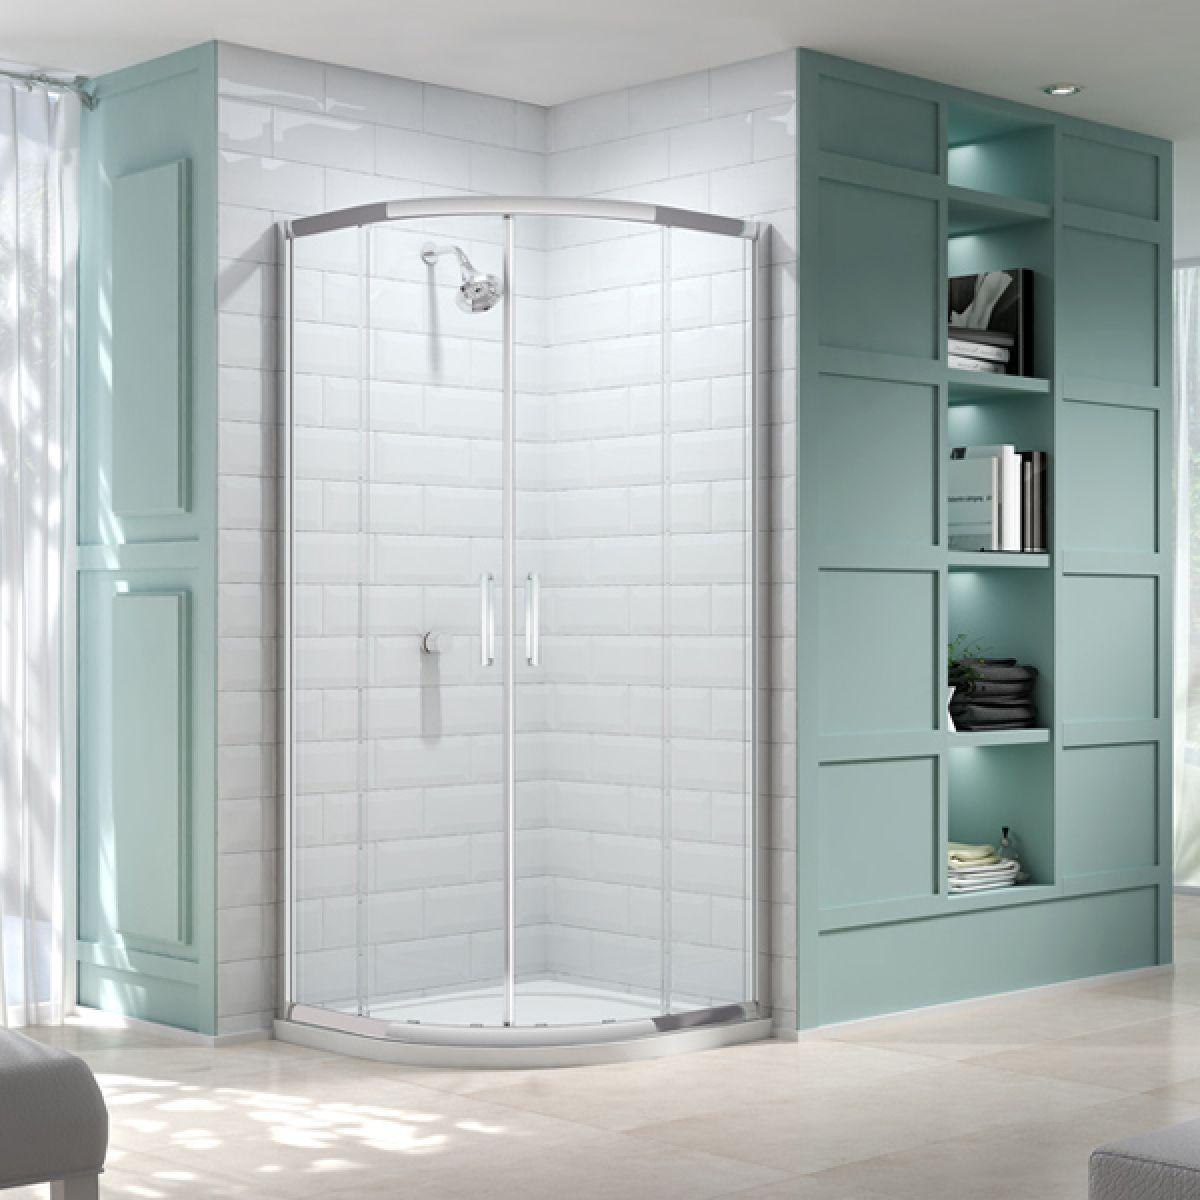 Merlyn Series 8 Double Door Quadrant Shower Enclosure